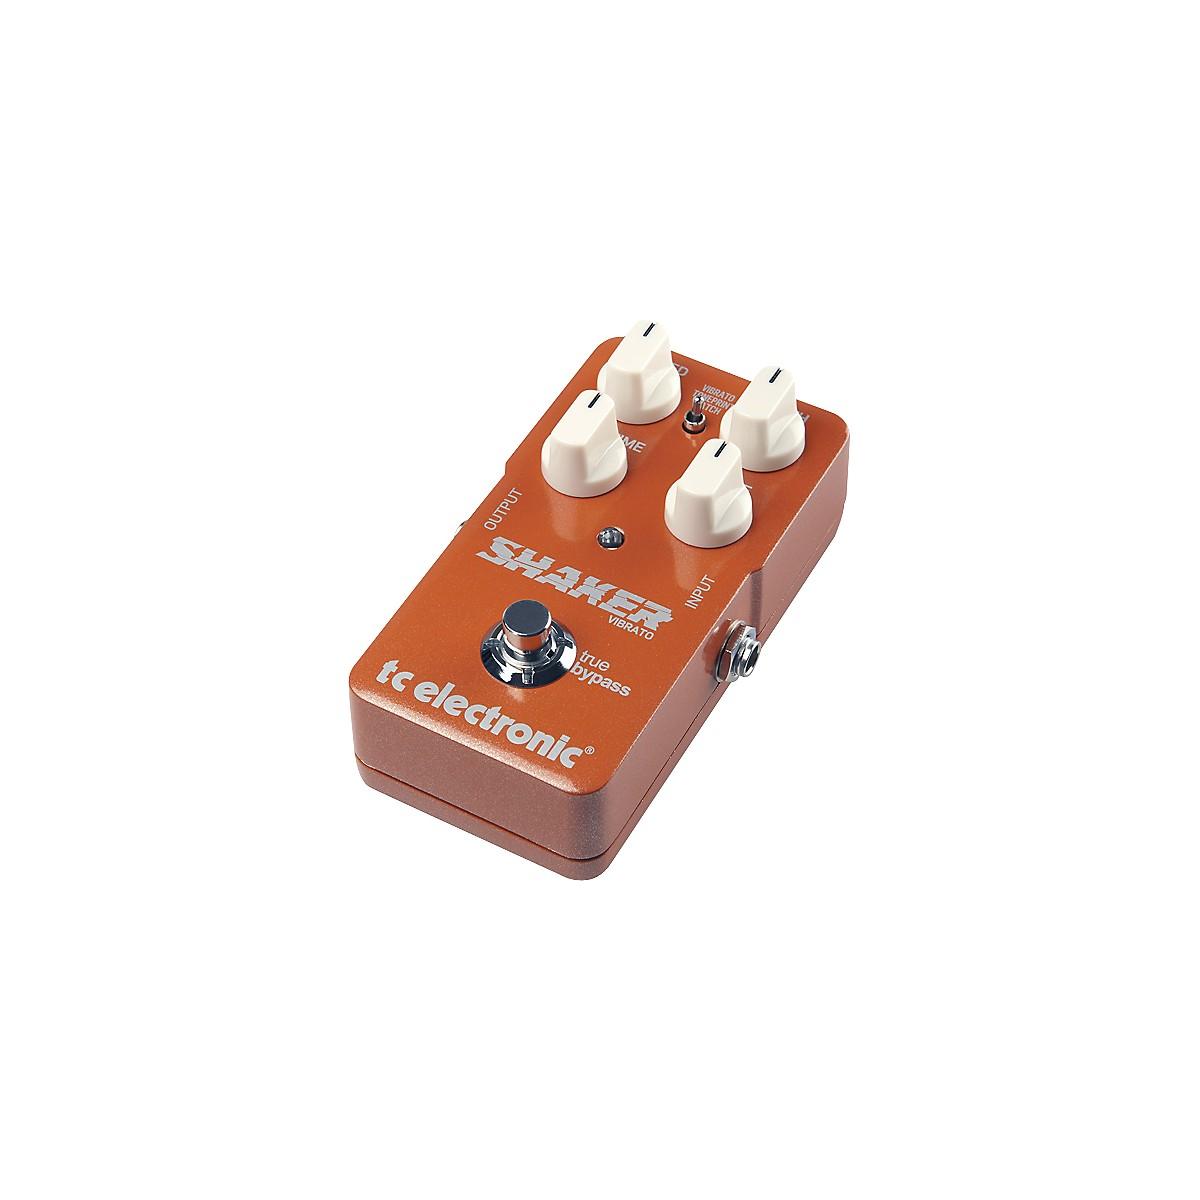 TC Electronic Shaker Vibrato TonePrint Series Guitar Effects Pedal